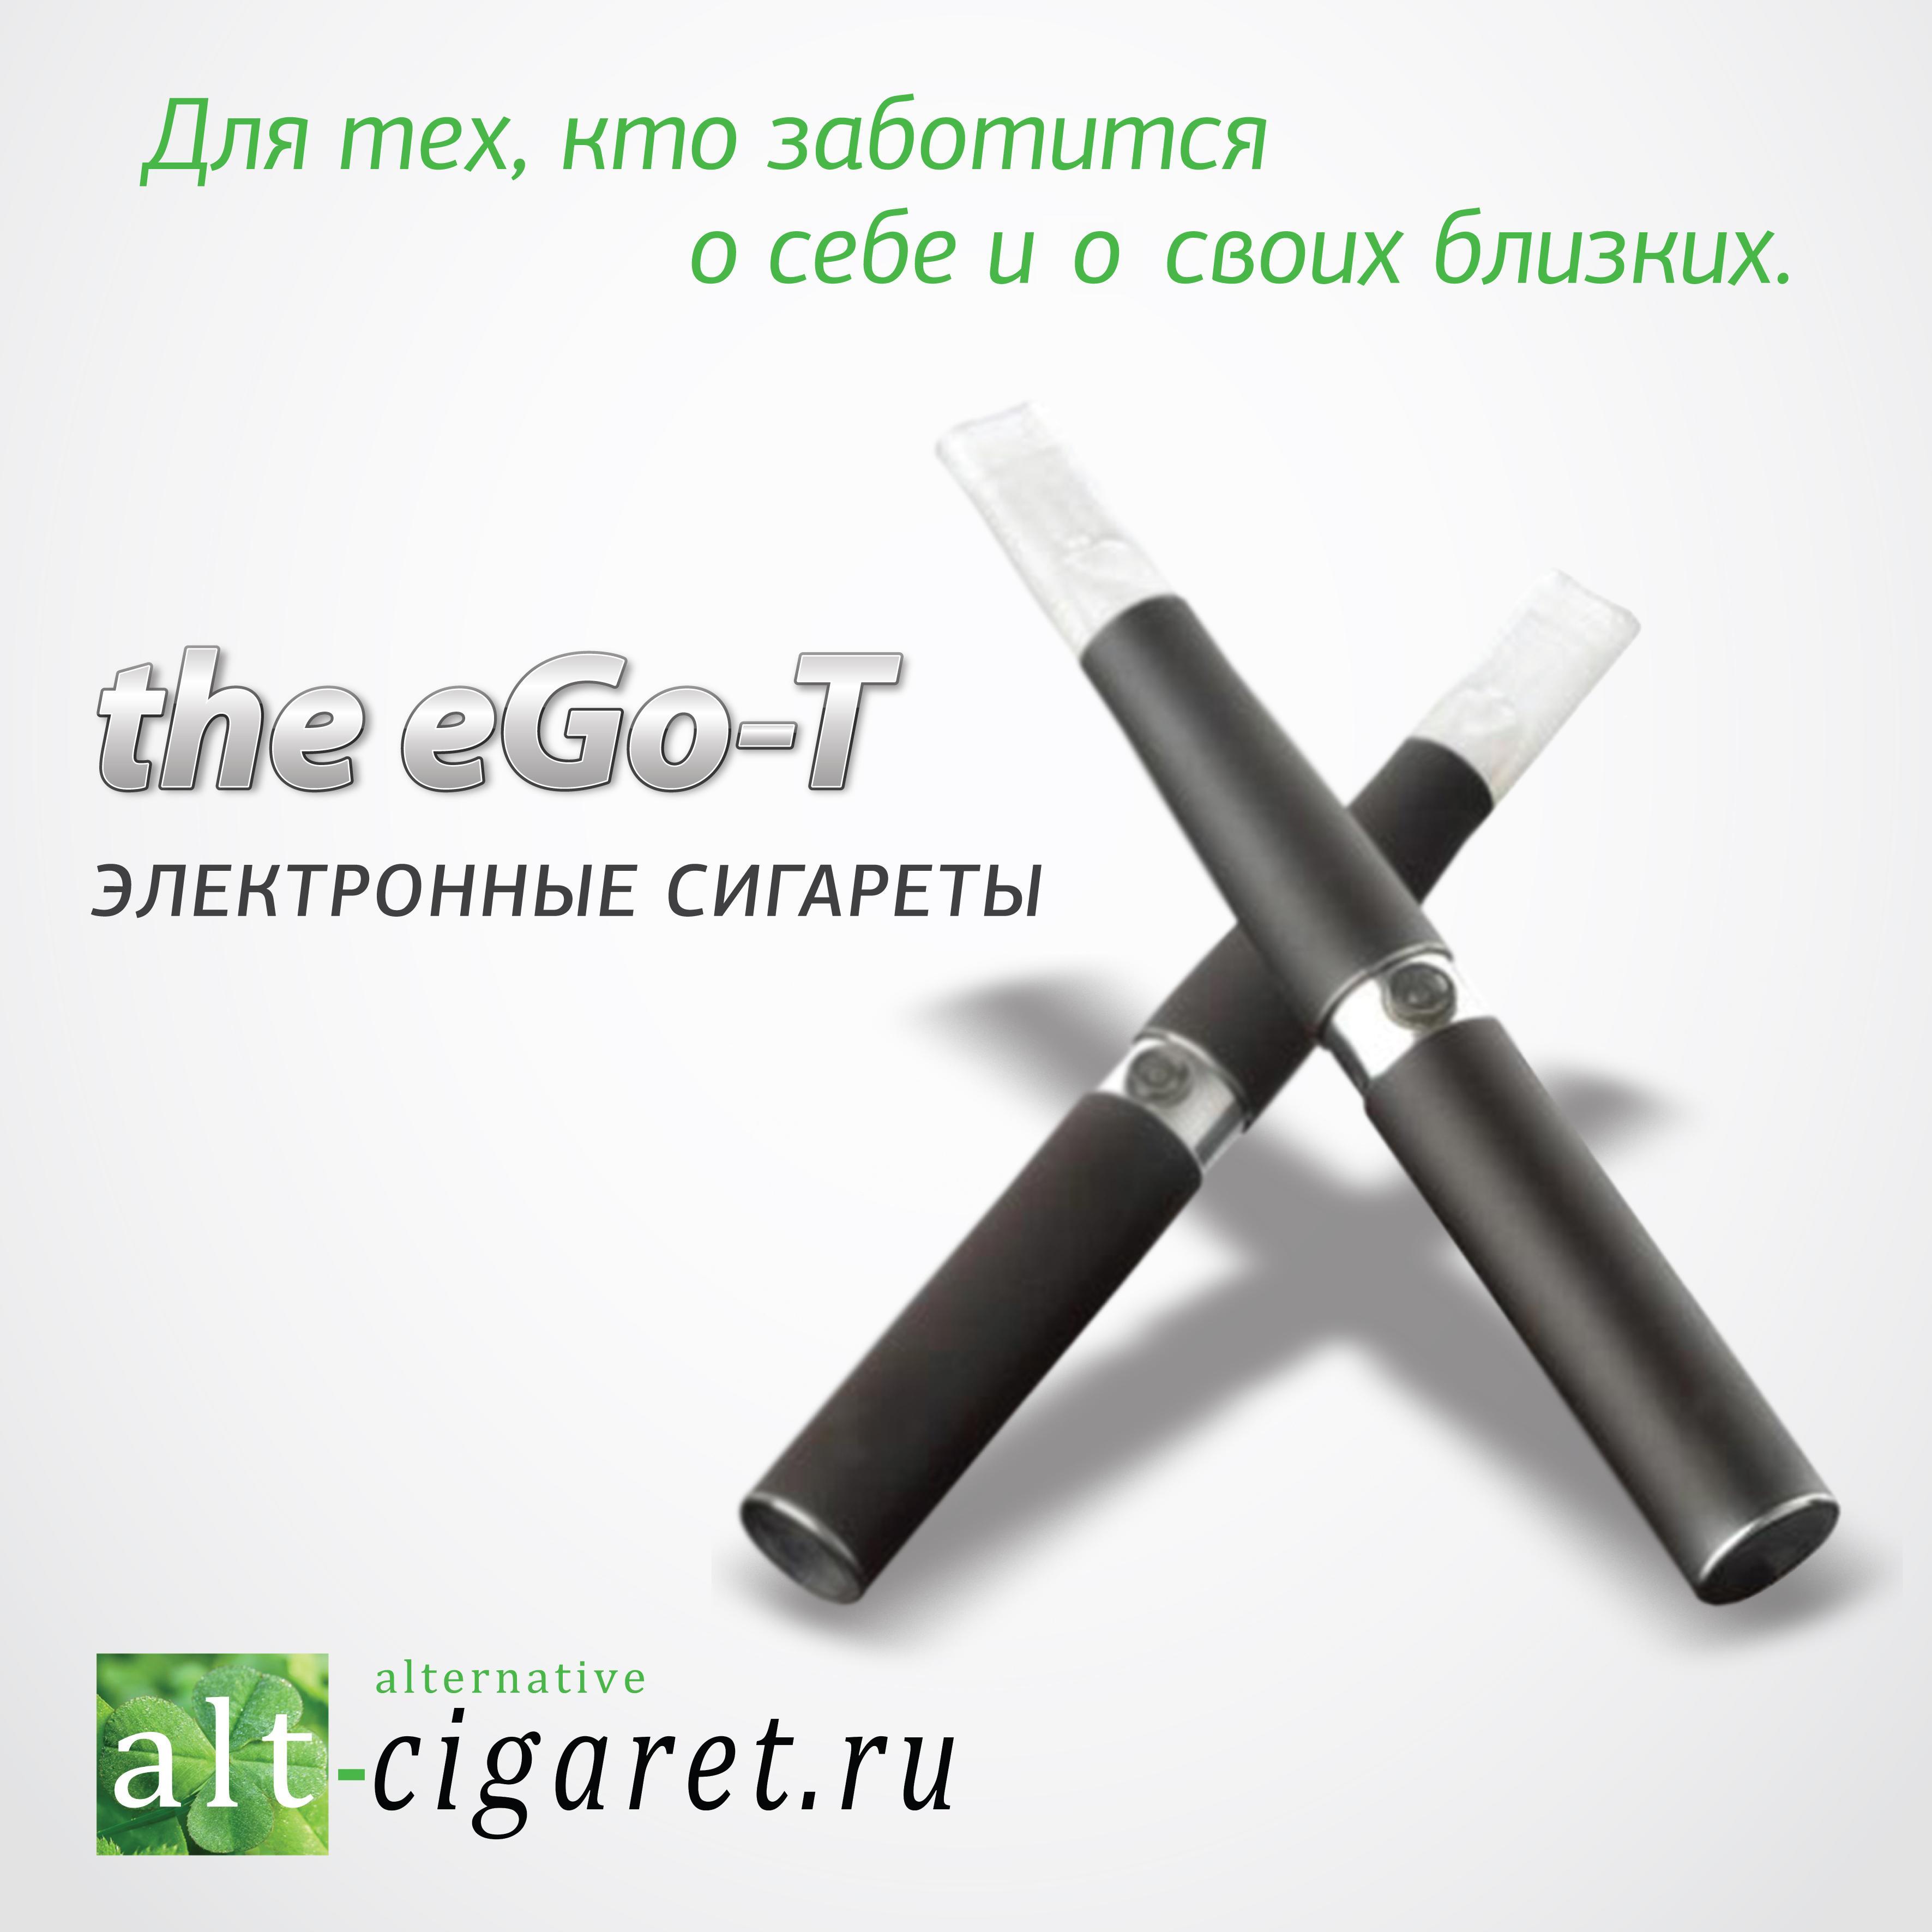 Электронная сигарета Калуга